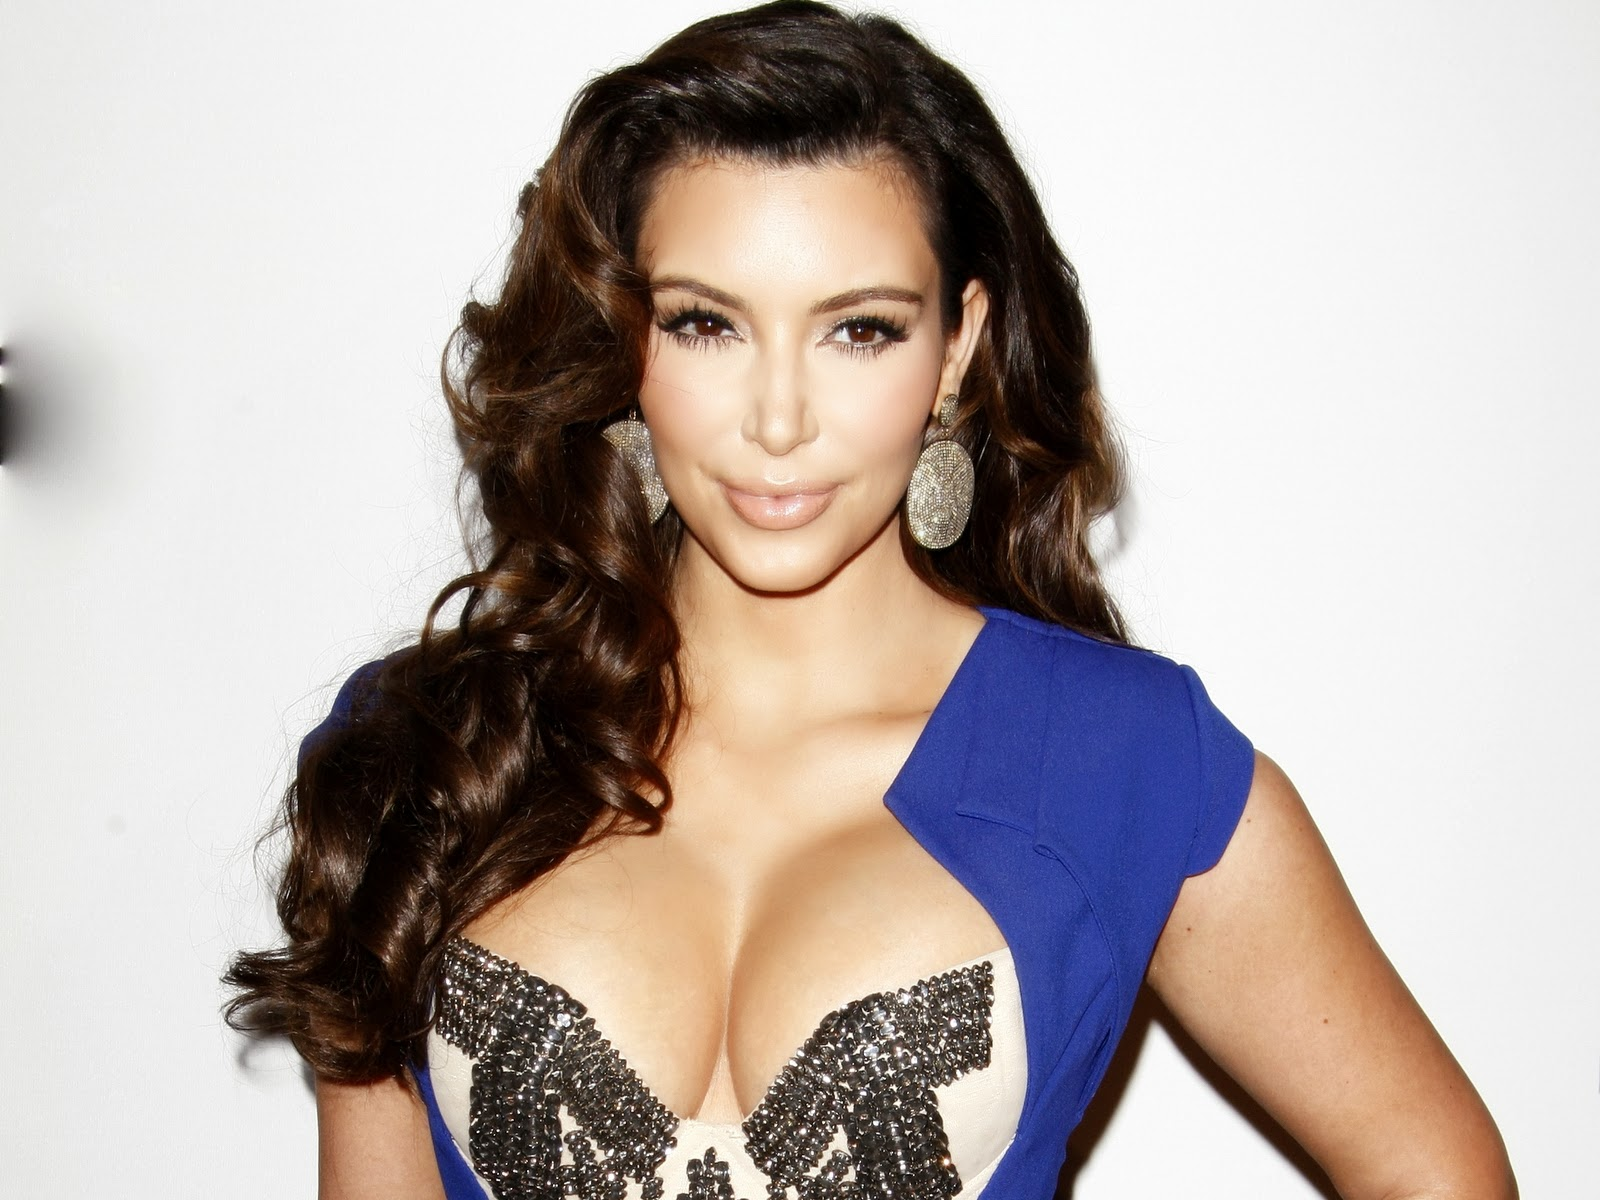 Kim Kardashian New Hottest HD Wallpaper 2014 Wallpapers Universe 1600x1200